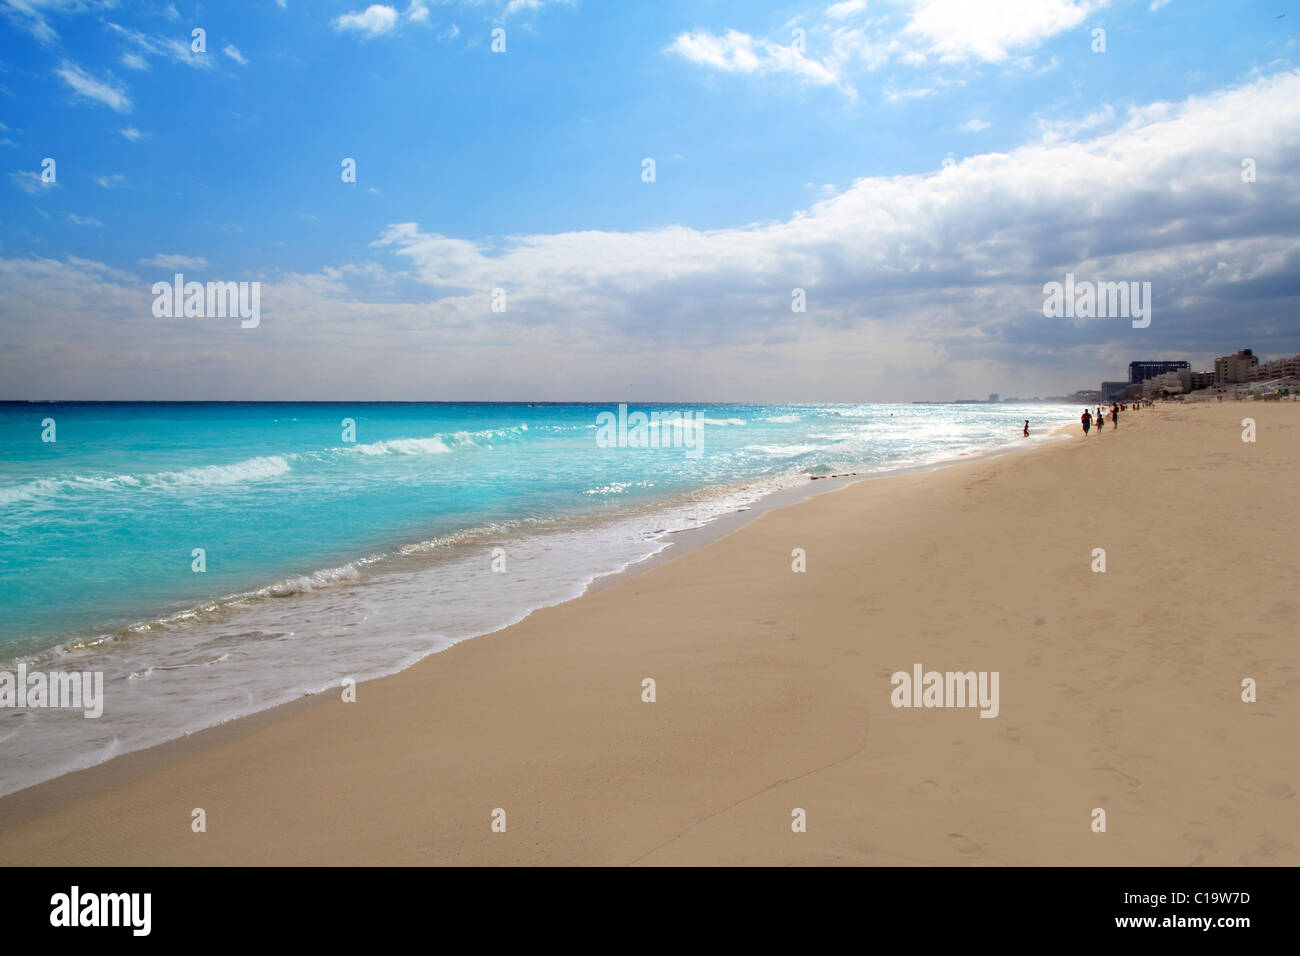 La zona hotelera de Cancún playa mar Caribe México perspectiva Imagen De Stock